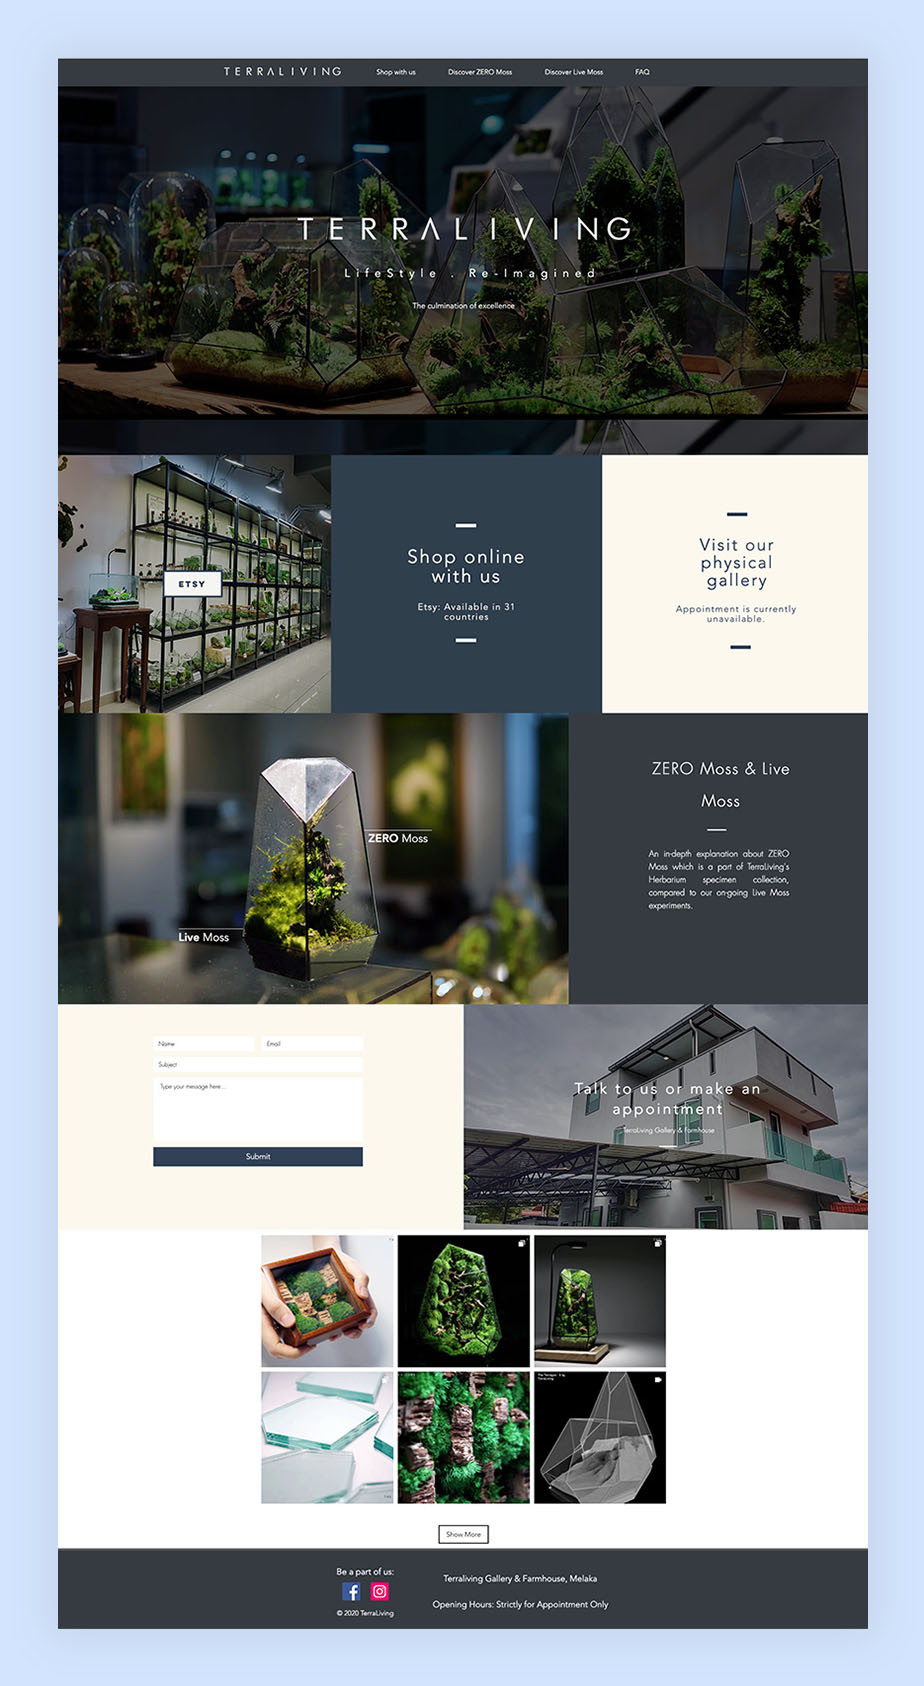 web site örnekleri: terraliving